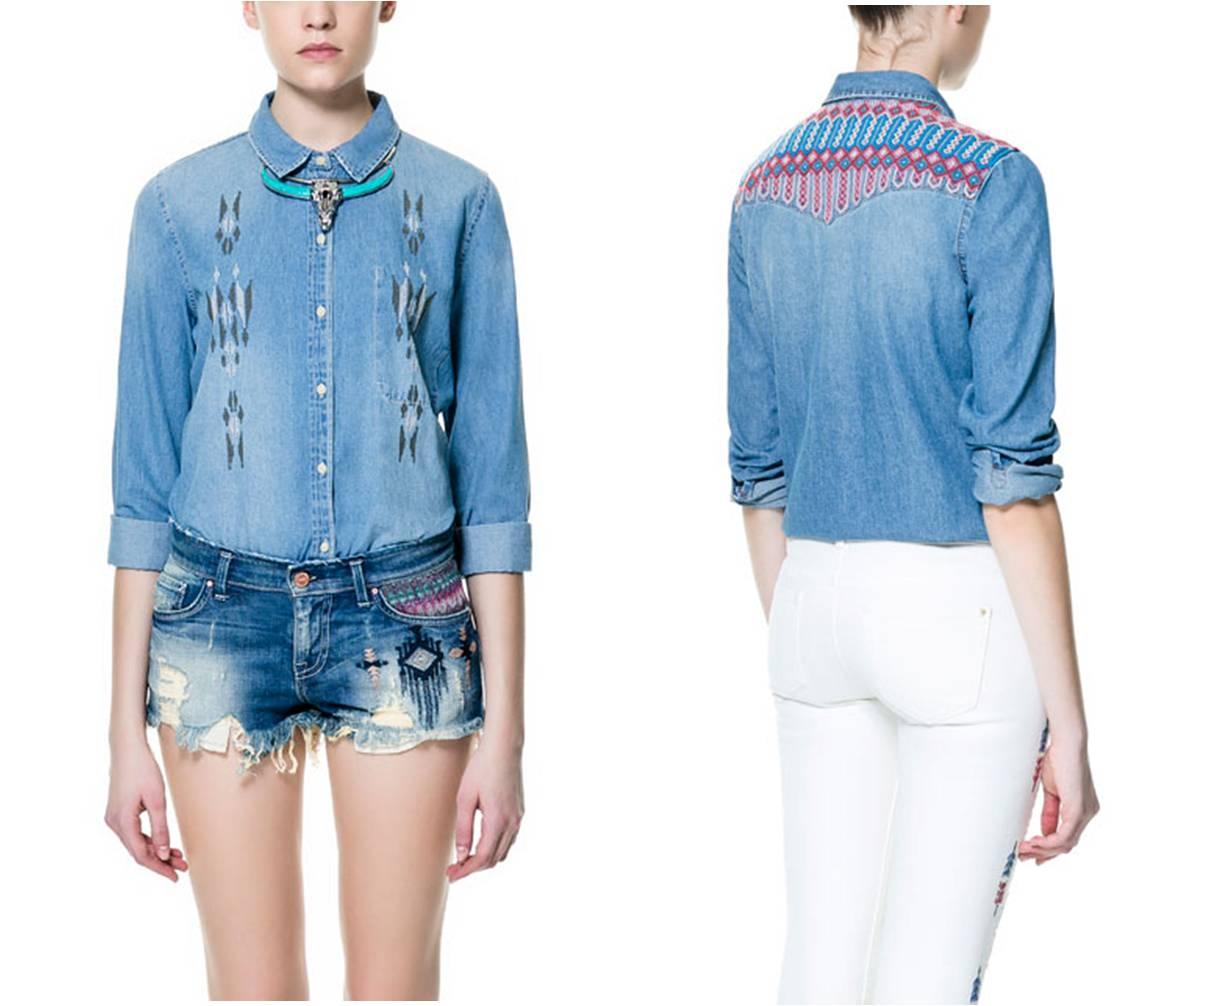 le moleskine de capucine l 39 indispensable chemise en jean. Black Bedroom Furniture Sets. Home Design Ideas